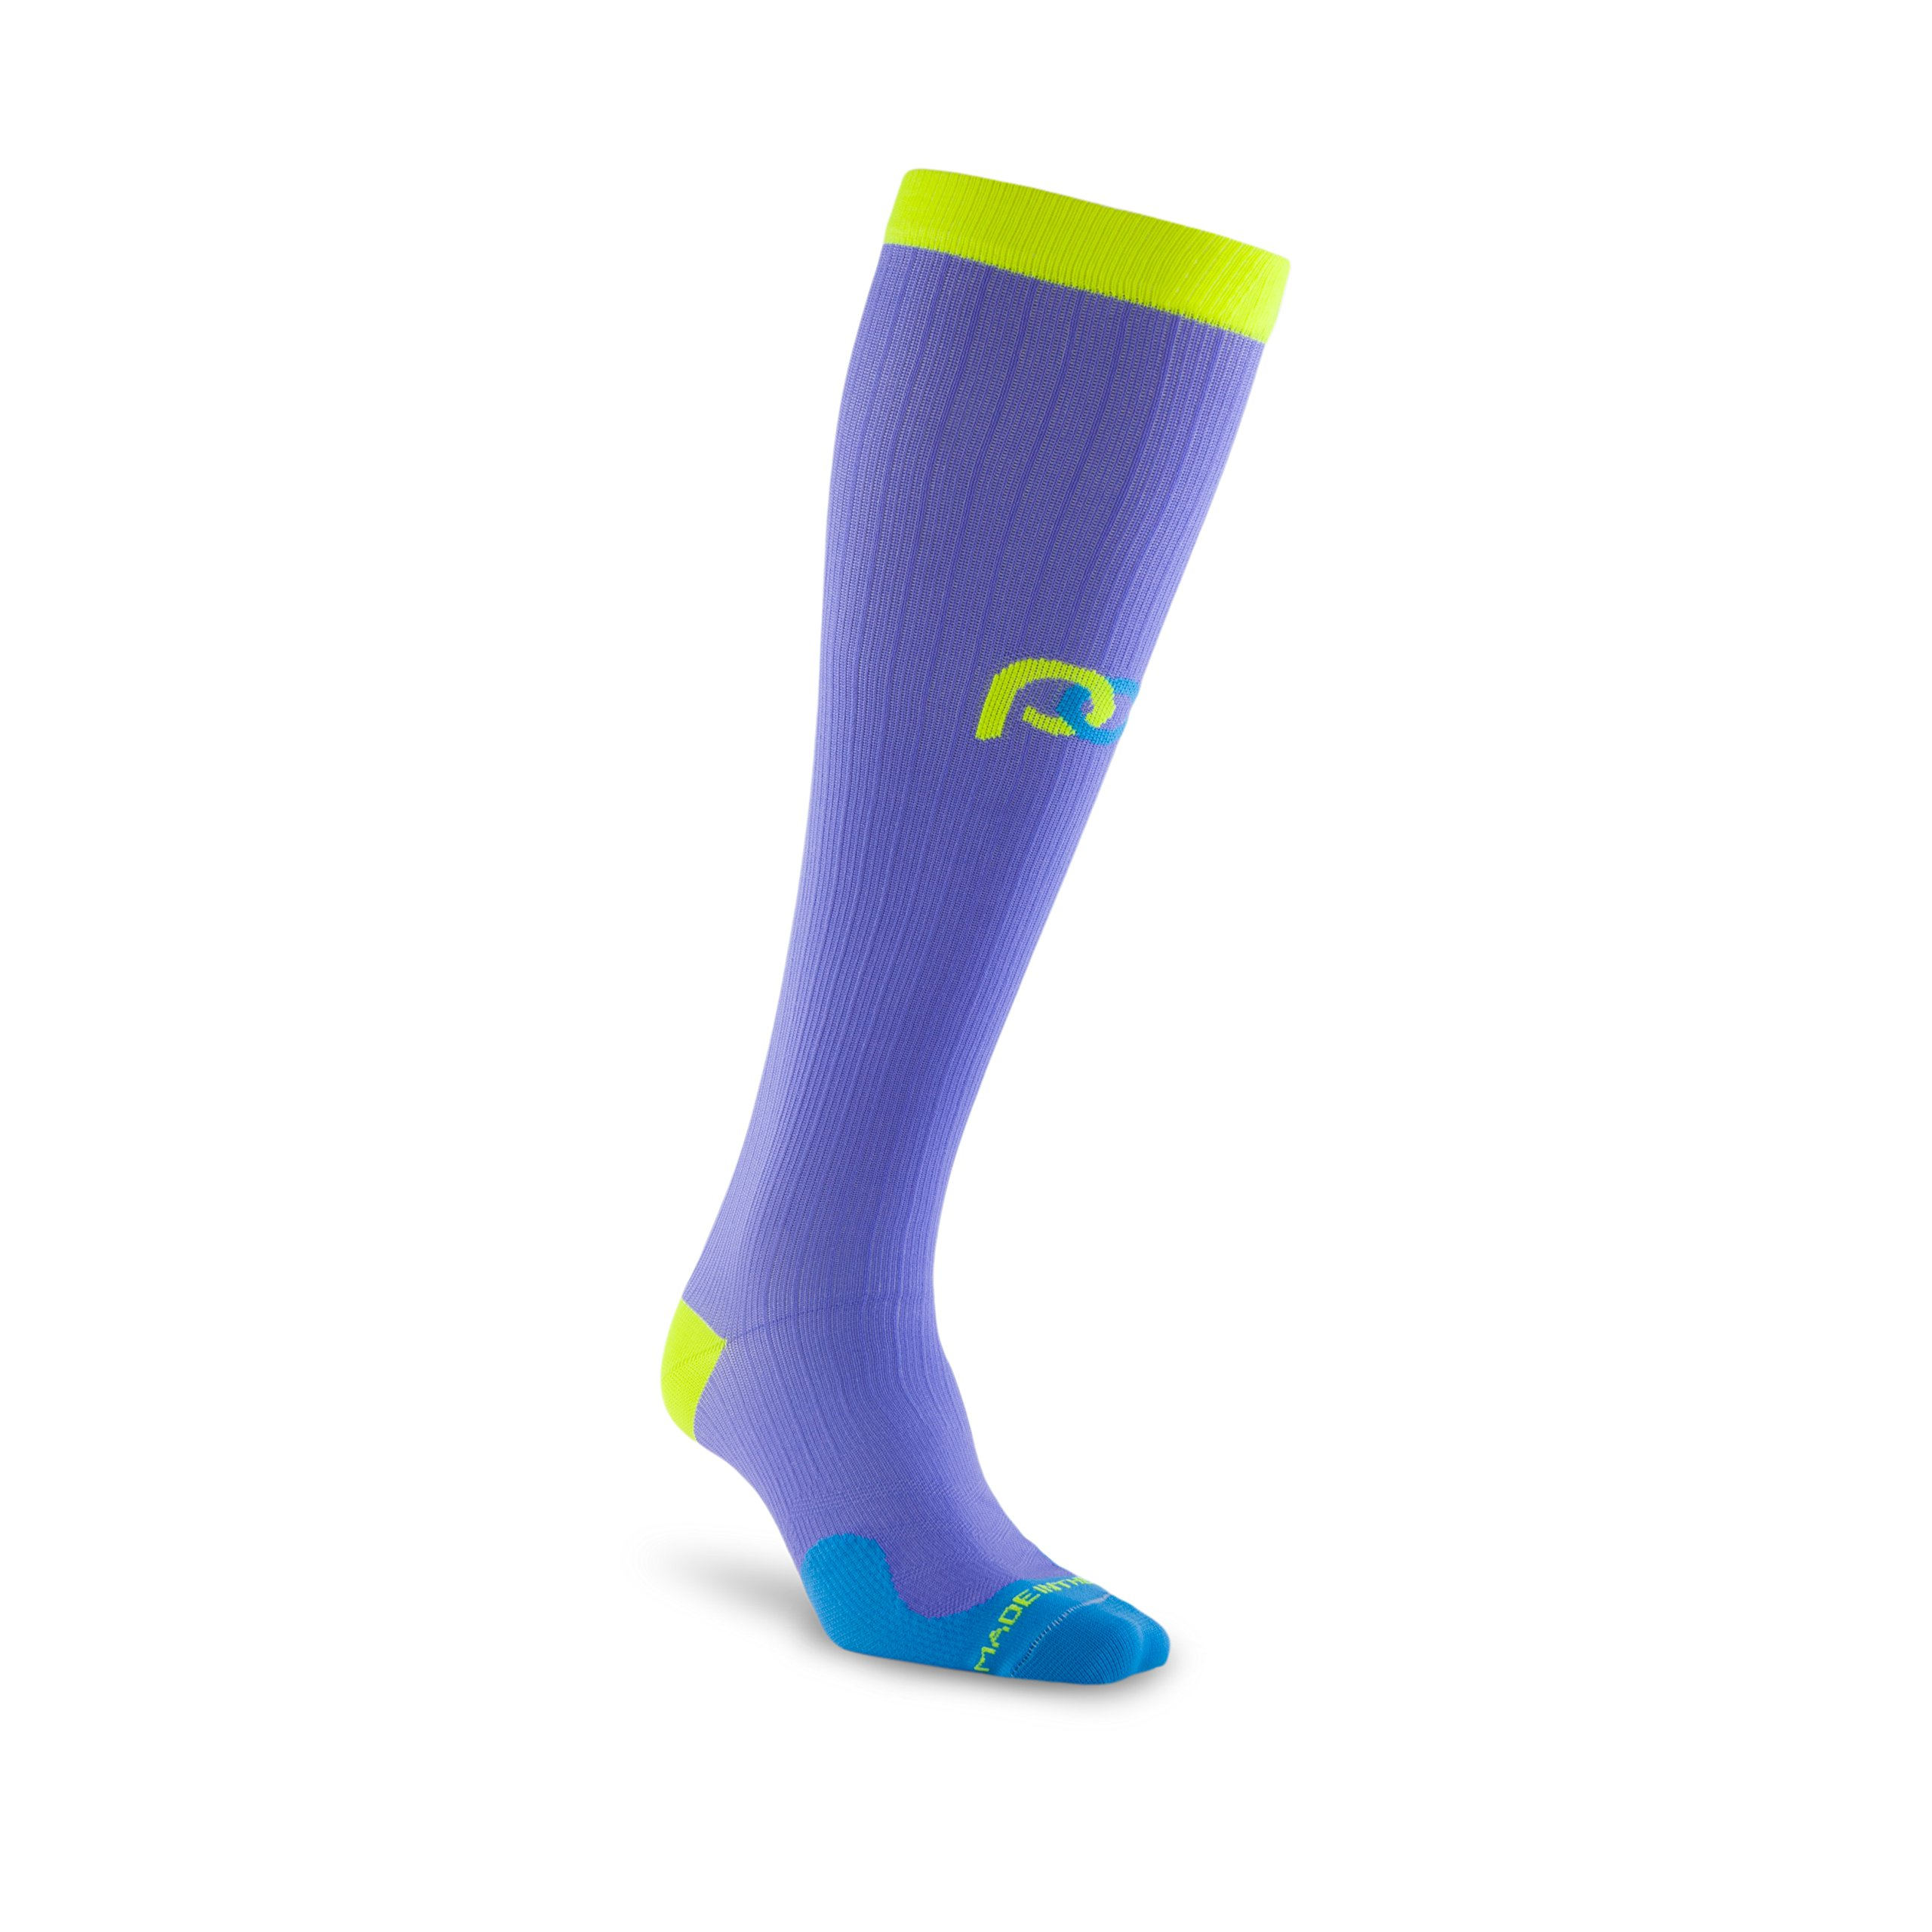 PRO Compression: Marathon (Full-Length, Over-the-Calf) Compression Socks, Lavender, Large/X-Large by PRO Compression